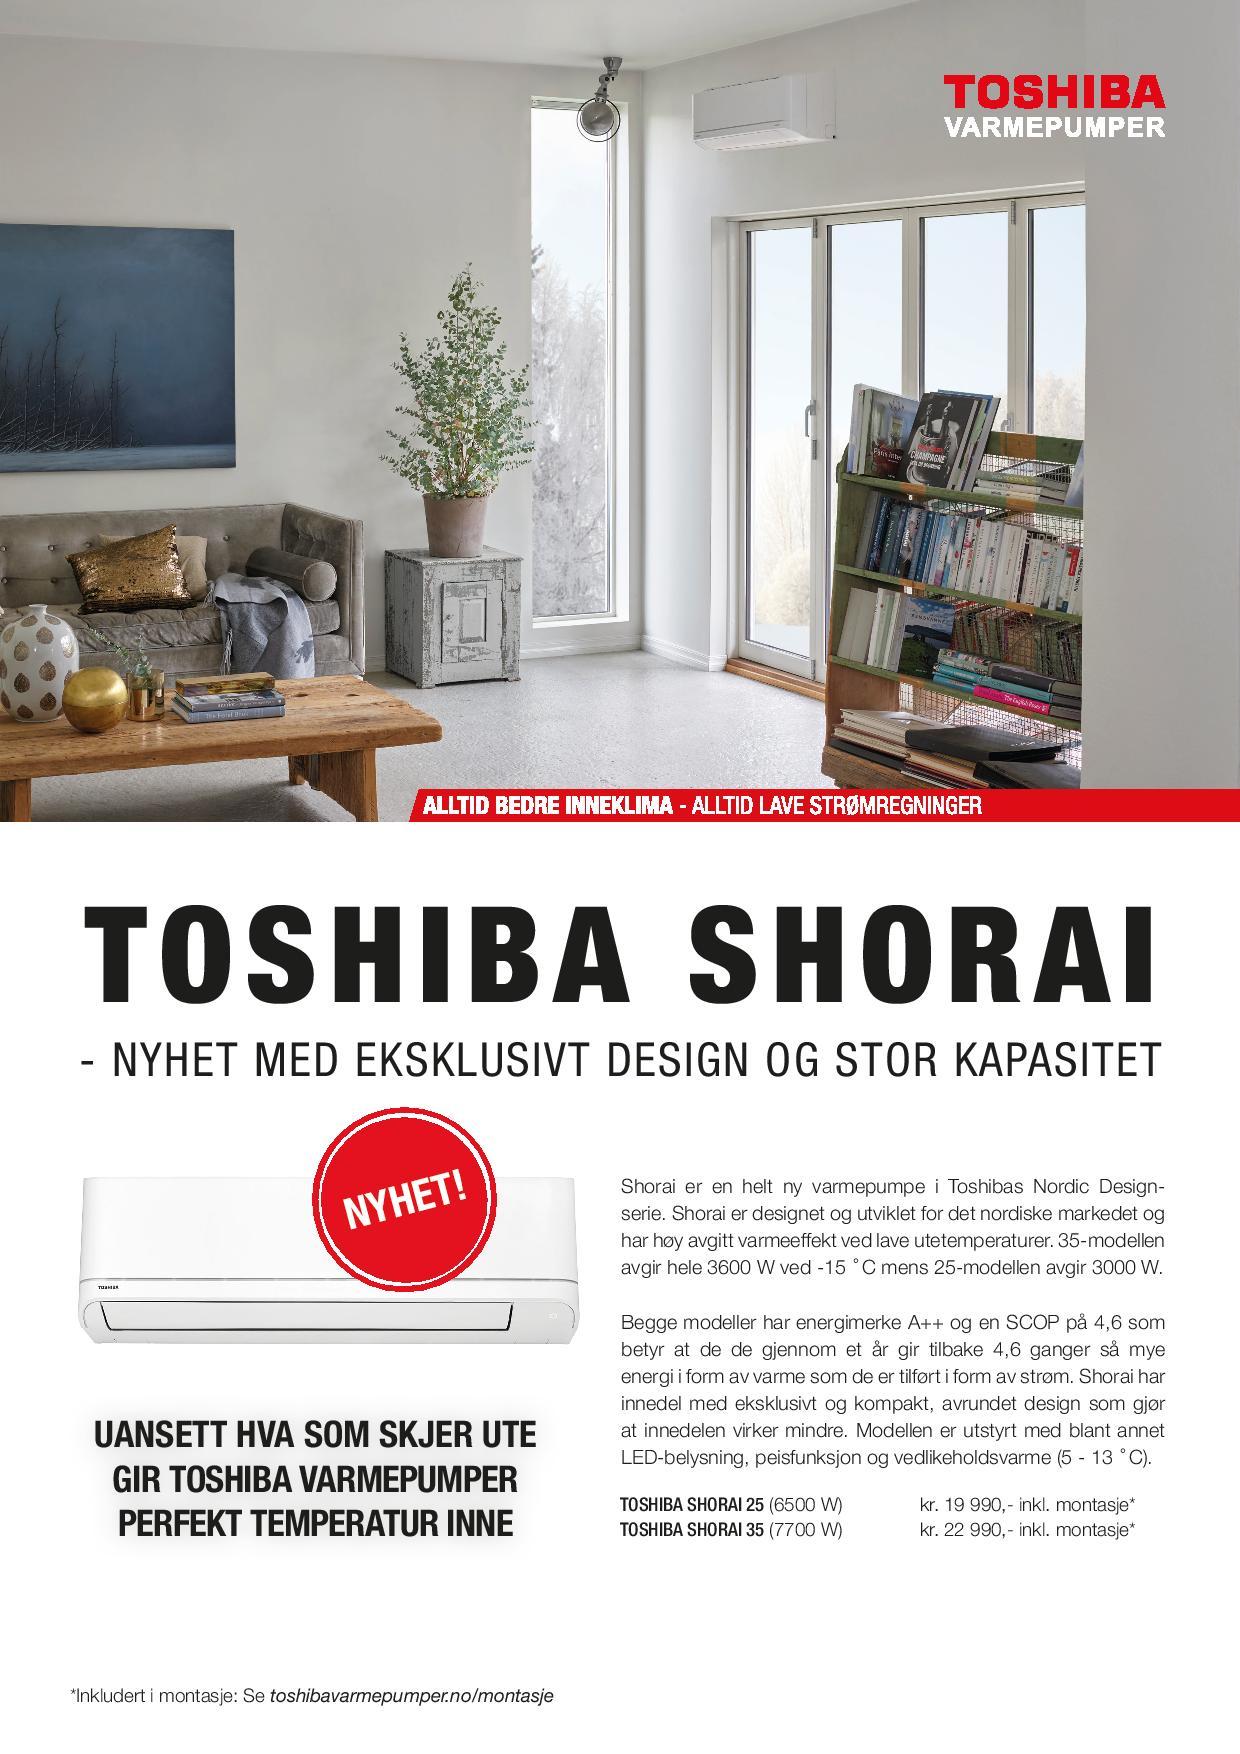 2017-sept-toshiba-shorai-nyhet-dm-a4-page-001